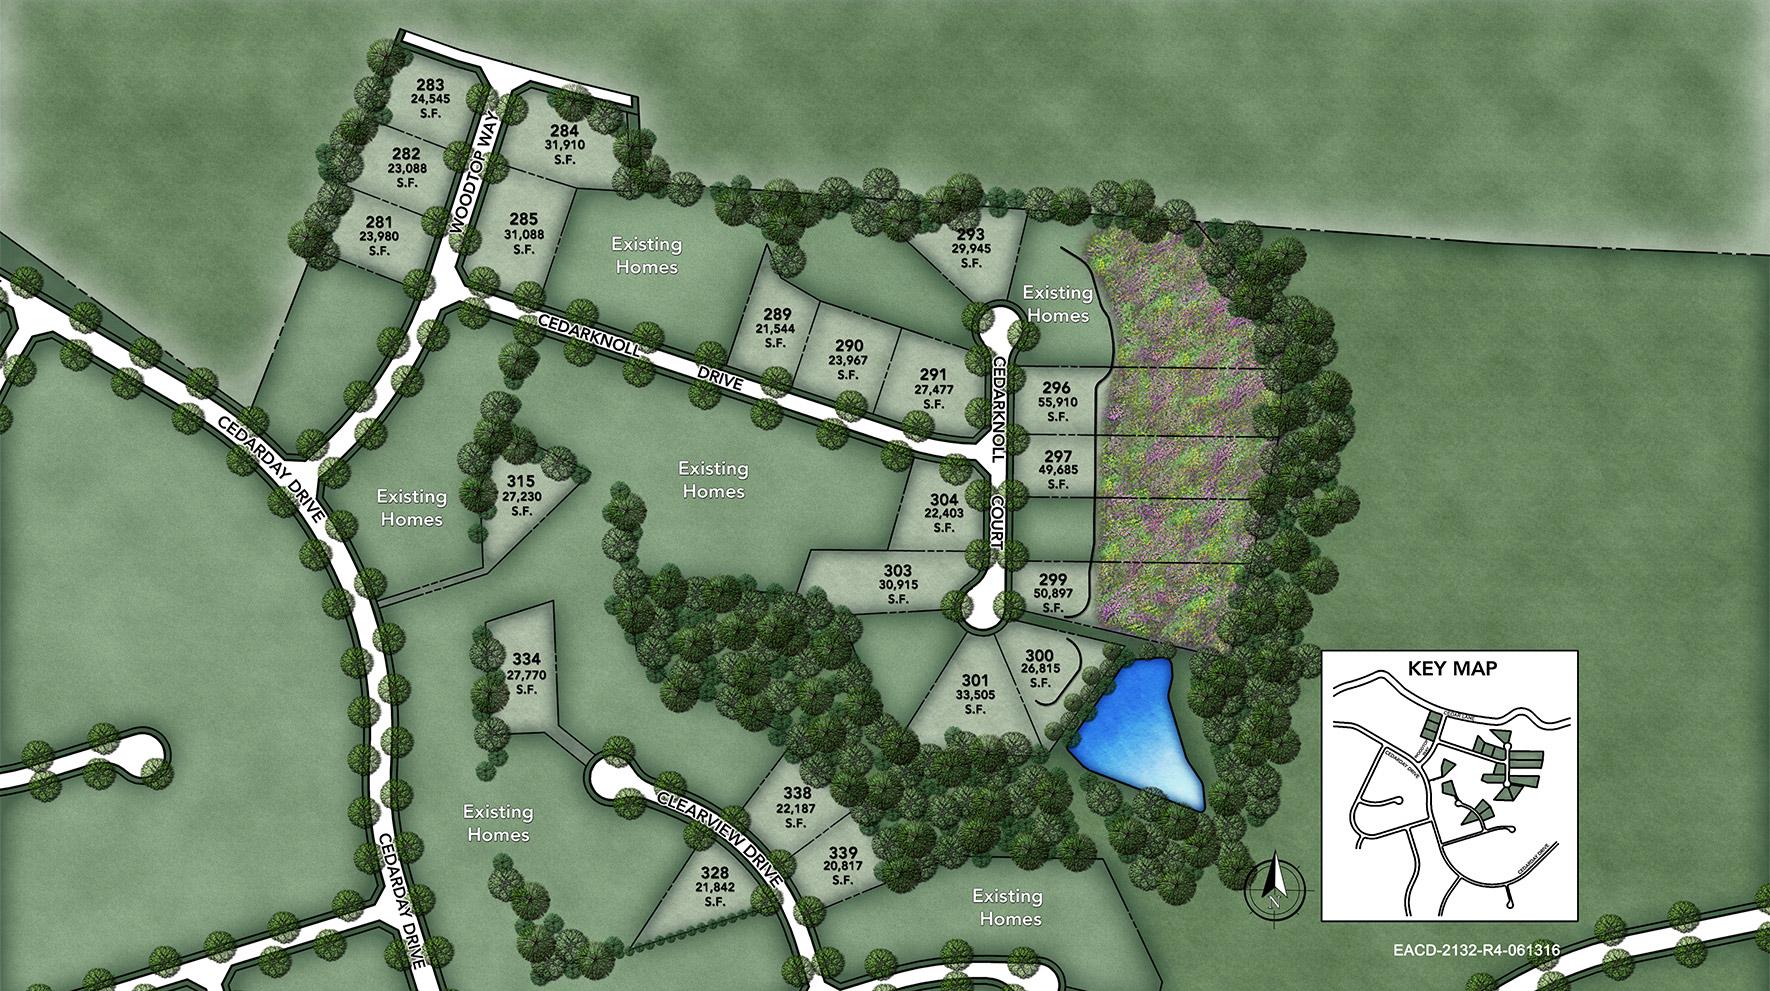 The Estates at Cedarday Site Plan I